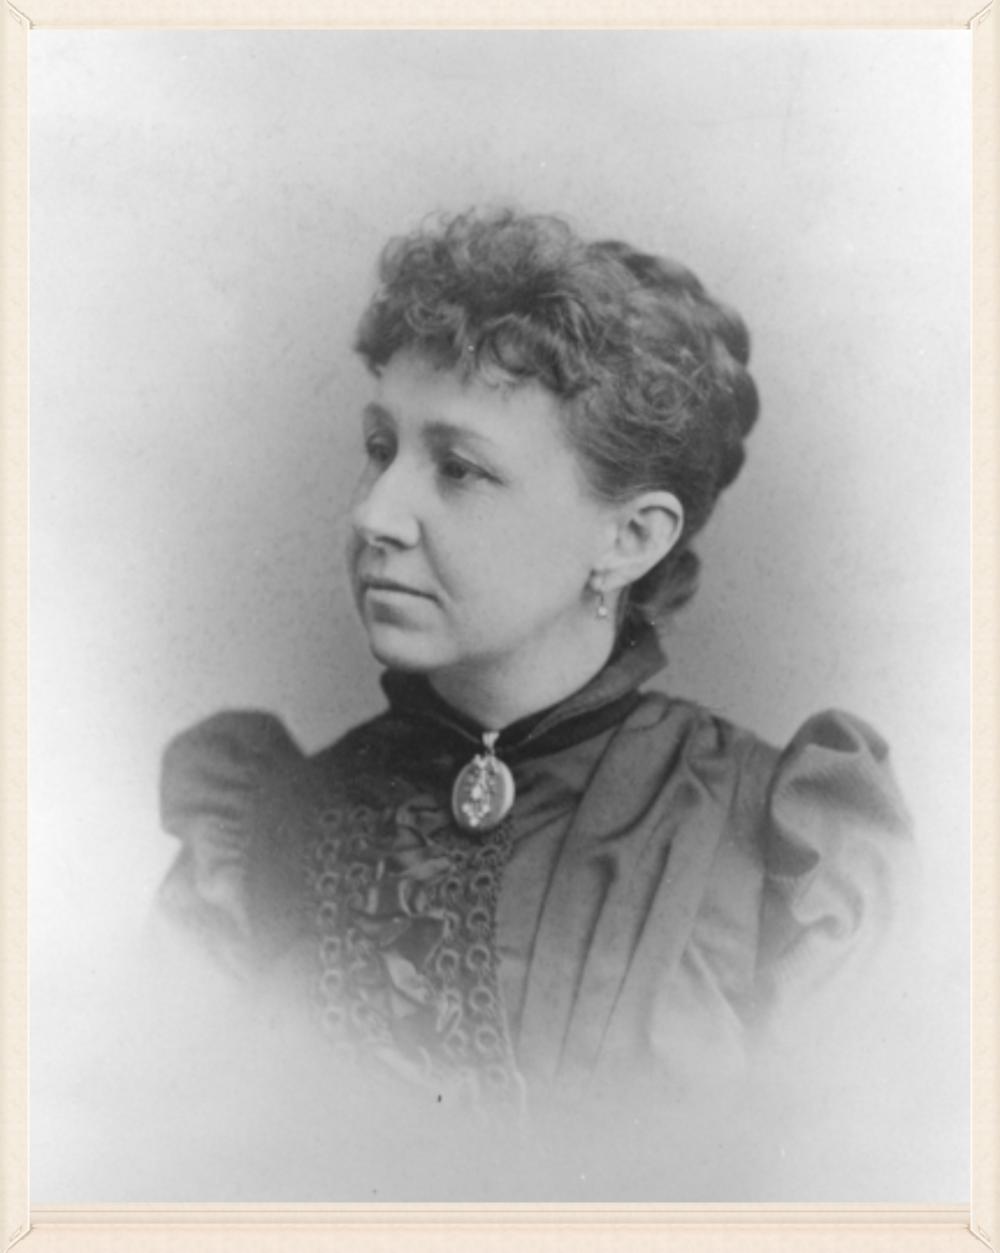 Margaret Forman Bashford Burmister